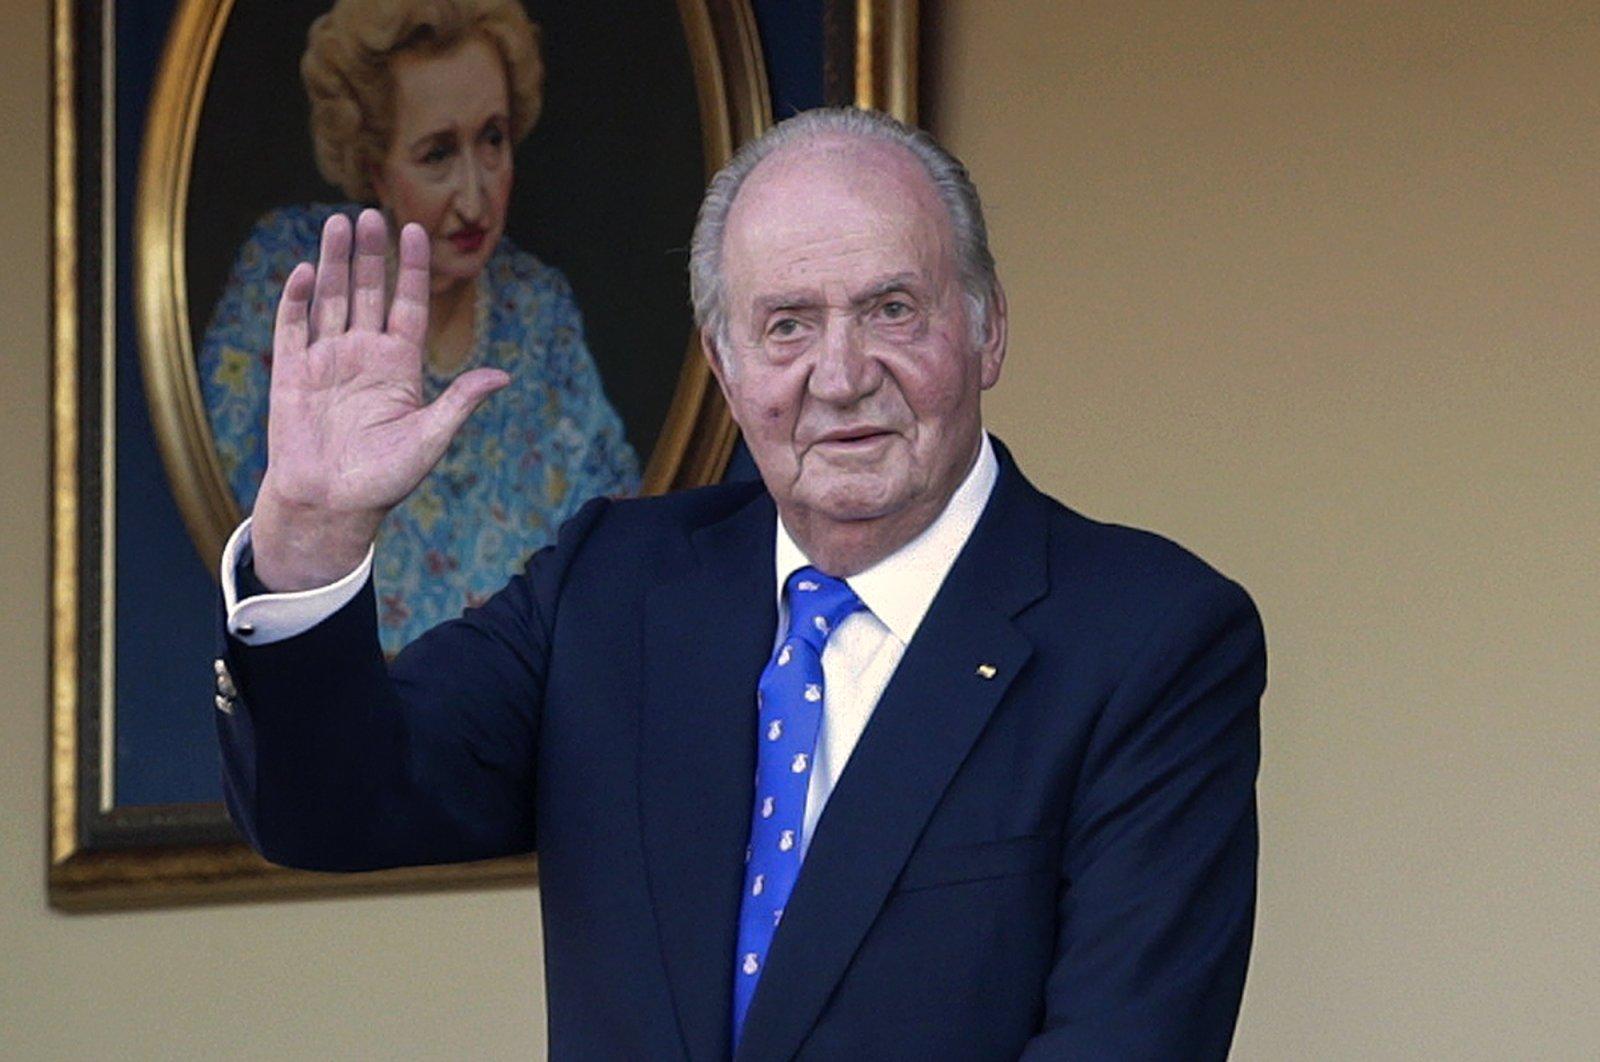 Spain's former King Juan Carlos waves during a bullfight at the bullring in Aranjuez, Madrid, Spain, June 2, 2019. (AP Photo)